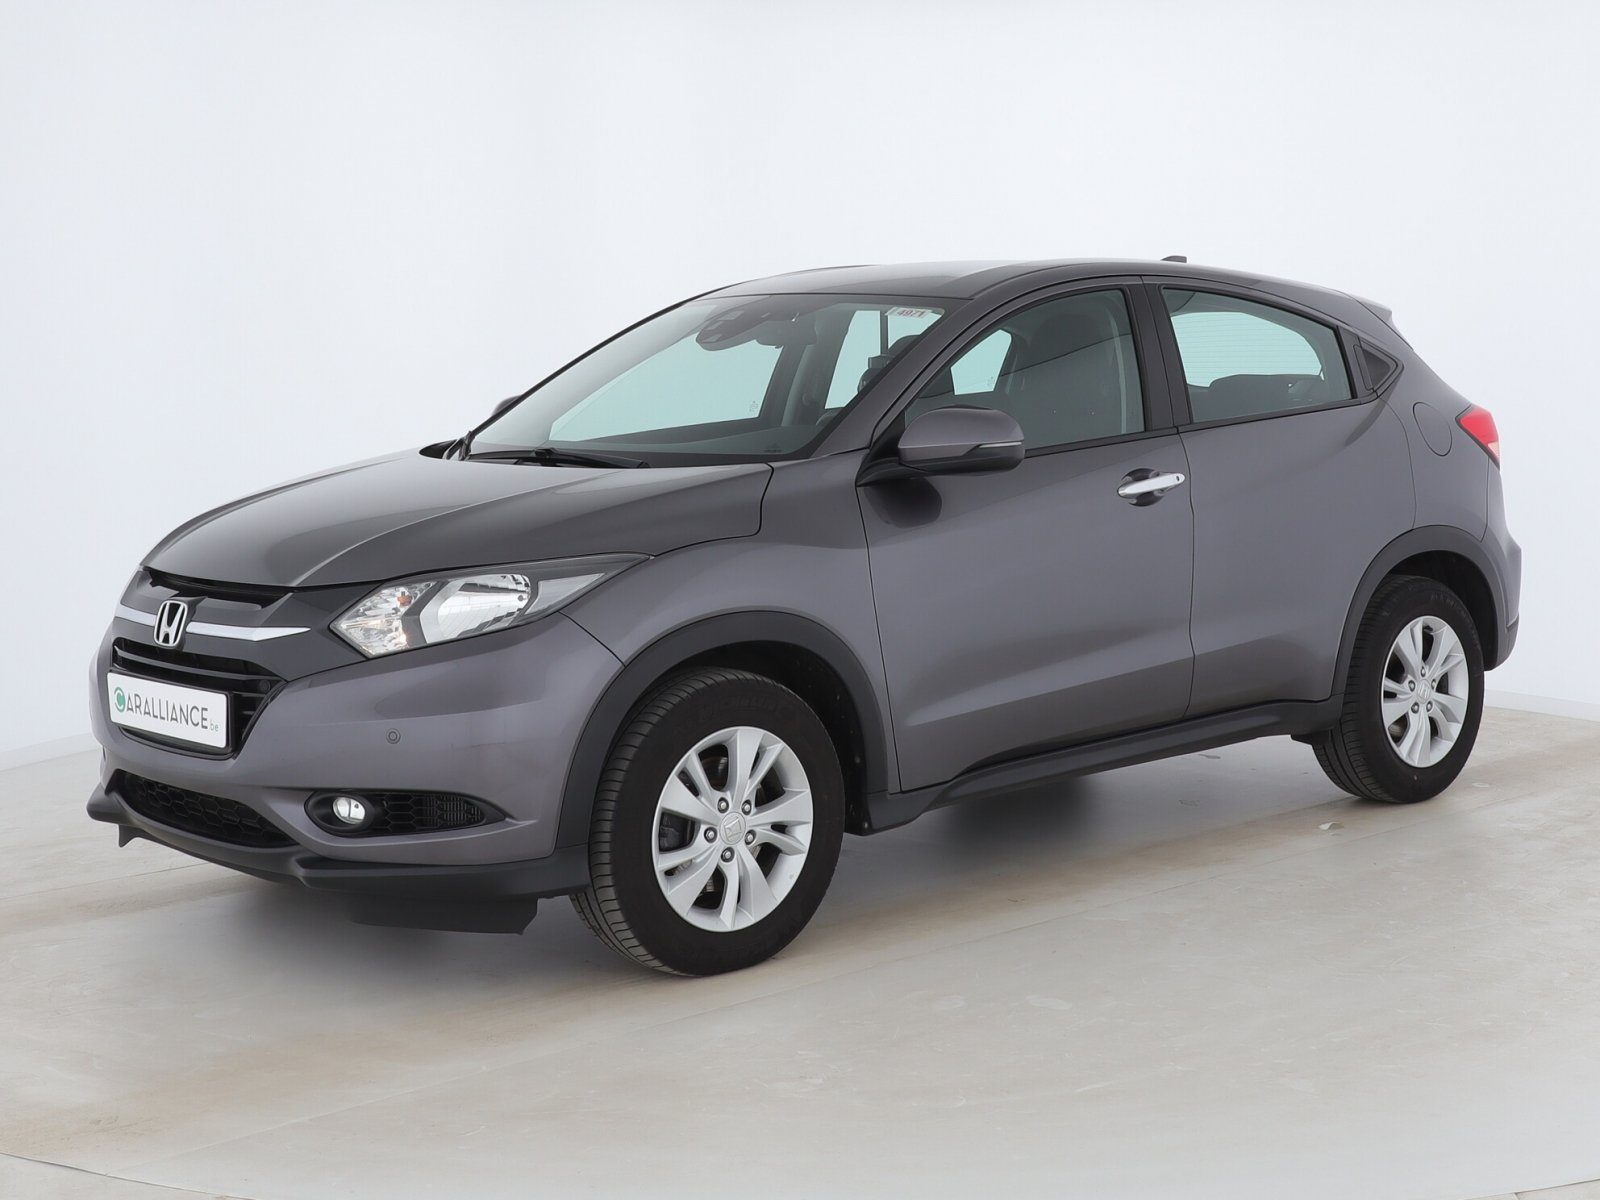 Honda – HR-V